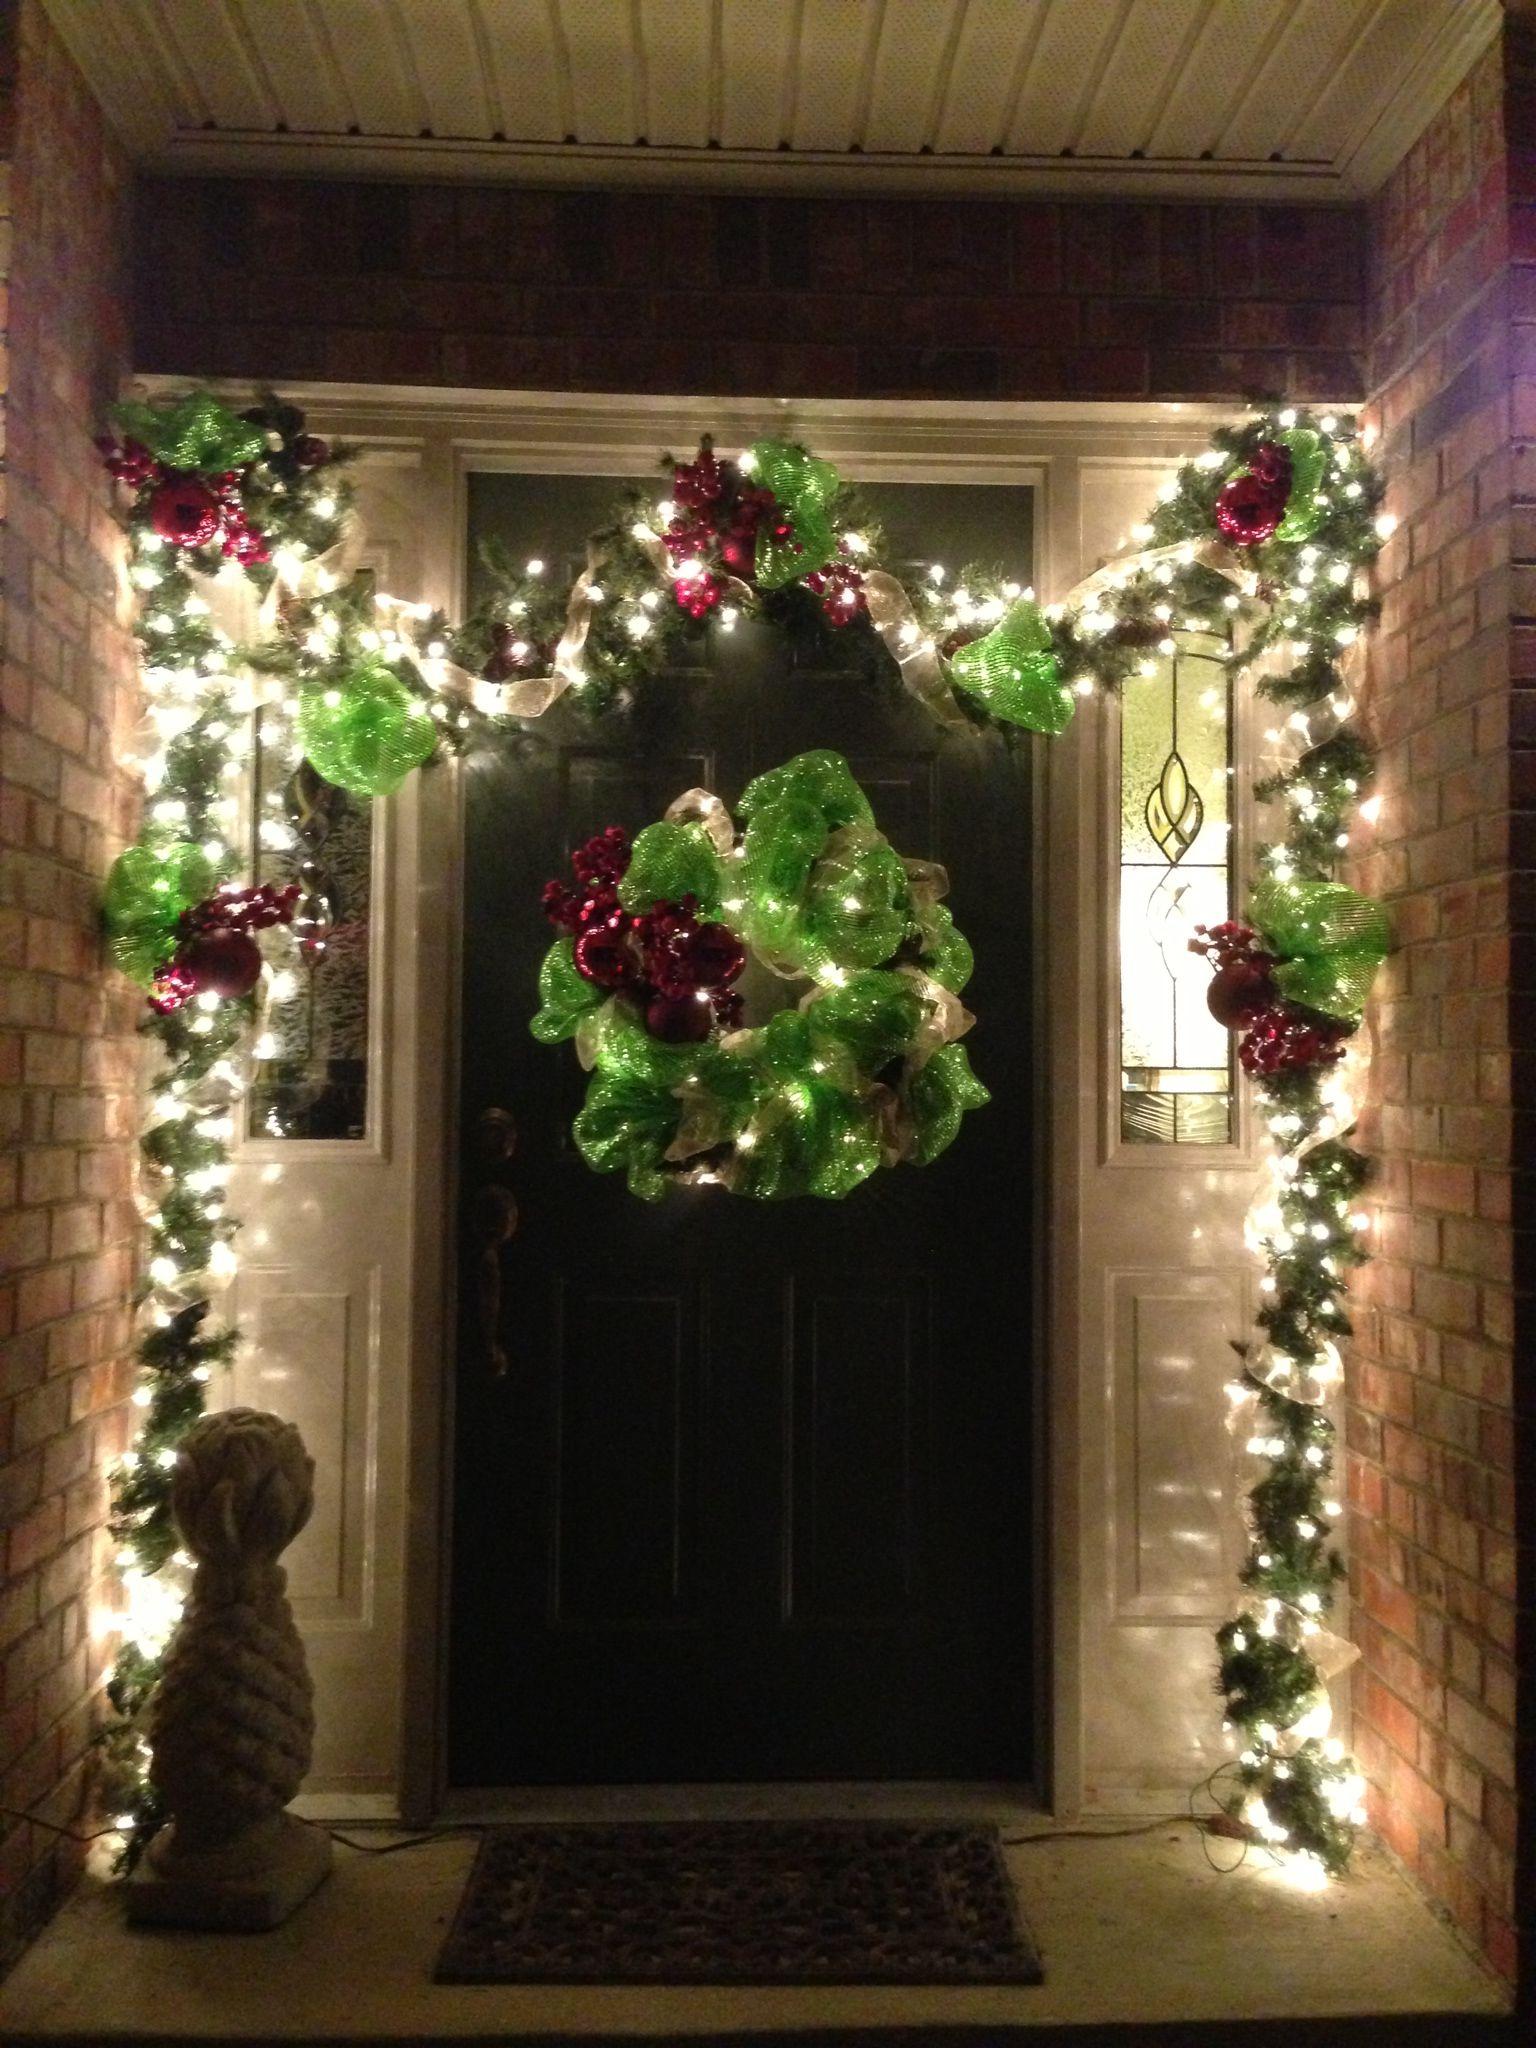 Christmas Decor Frontporch Diy Brightgreen Mesh Wreath Garland Outdoor Christmas Decorations Christmas Door Decorations Christmas Garland